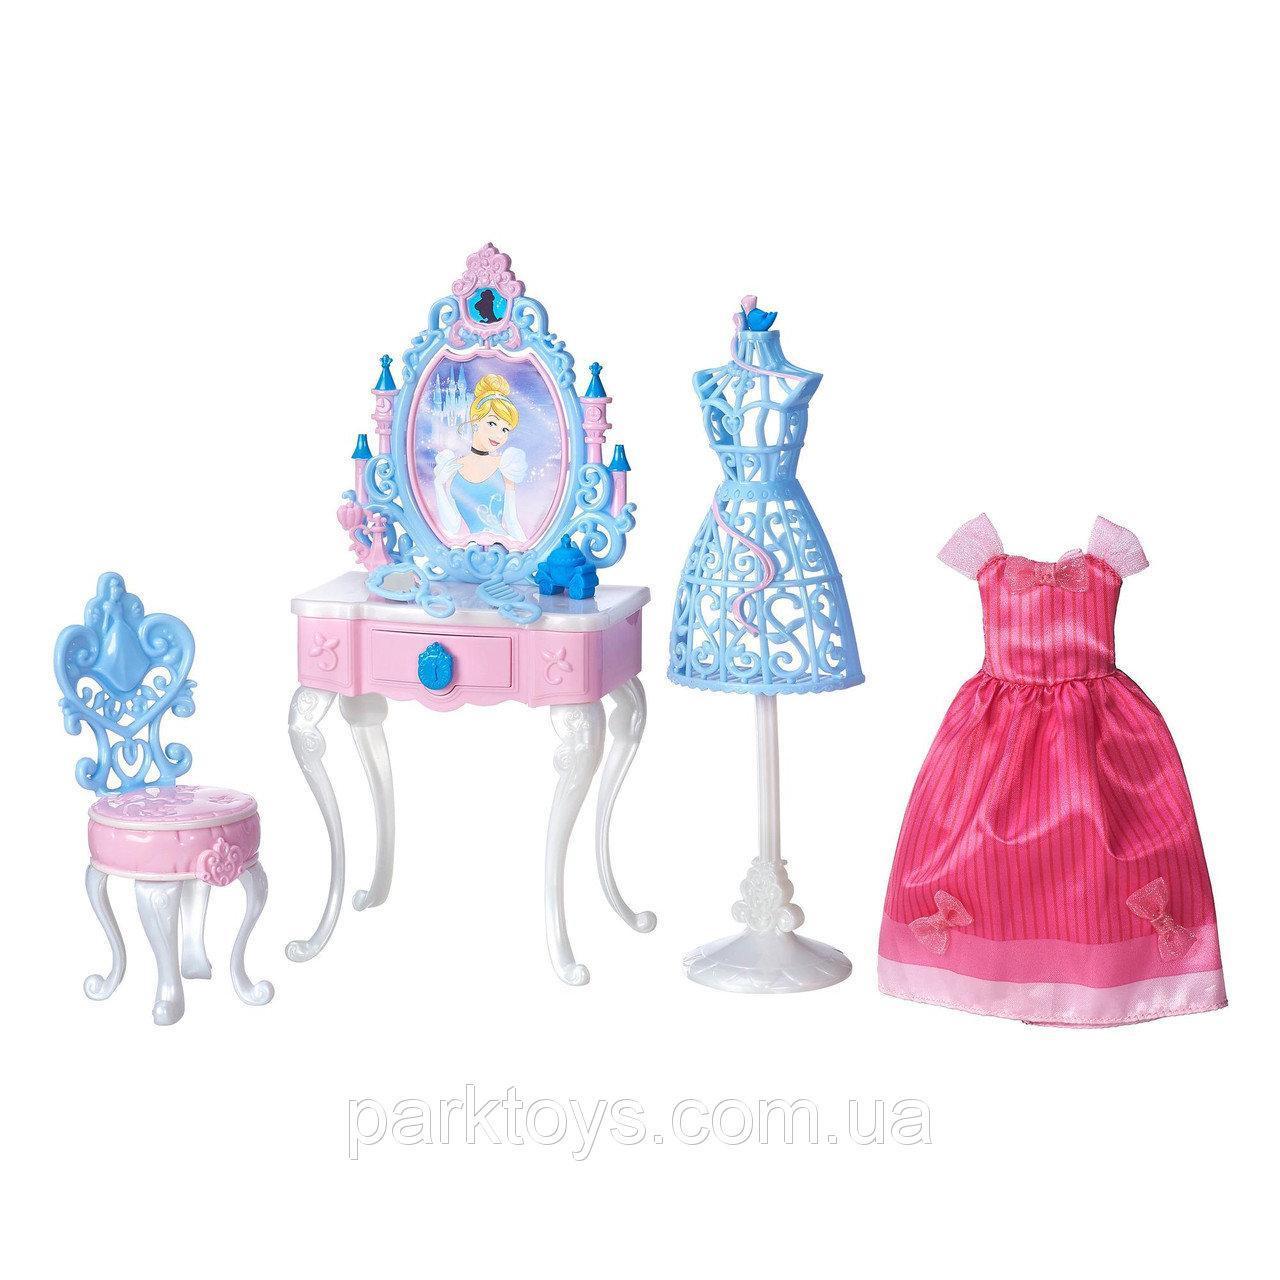 Disney Princess  Cinderella's Enchanted Vanity Set Туалетний столик Попелюшки (Туалетный столик Золушки)